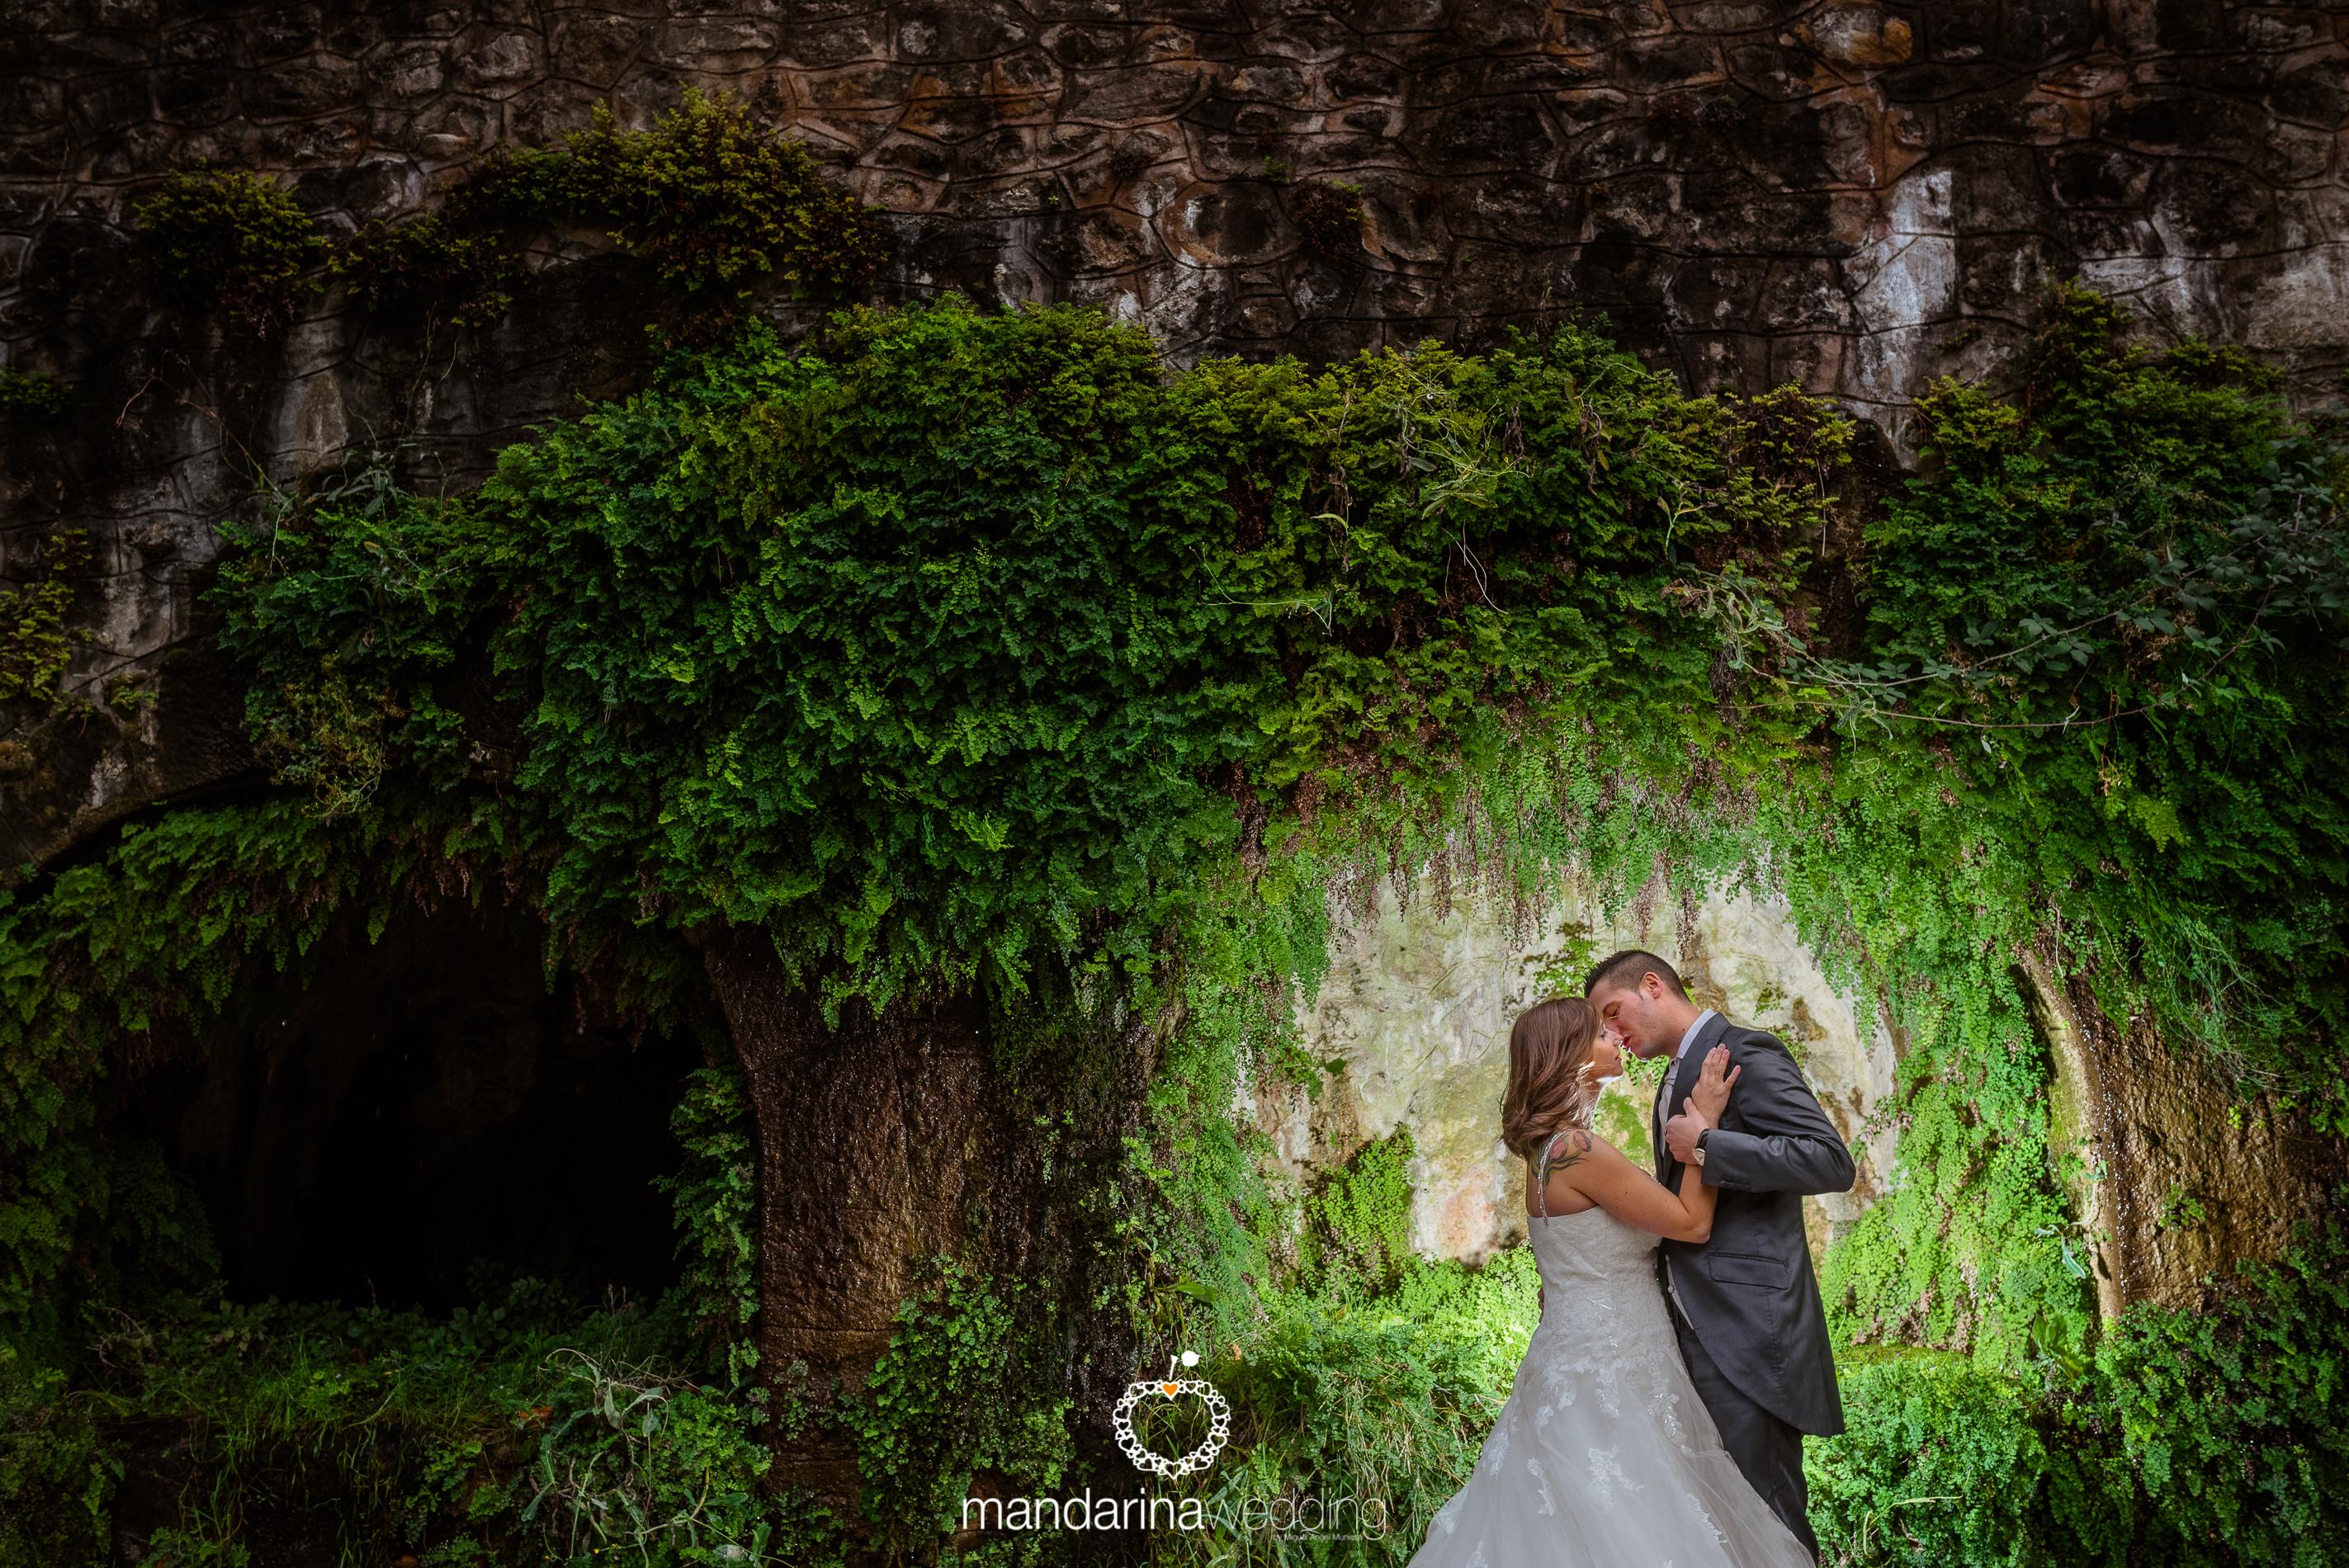 mandarina wedding, fotogarfos boda zaragoza, postboda, postboda en oliete, fotografos boda teruel, fotografos huesca_07